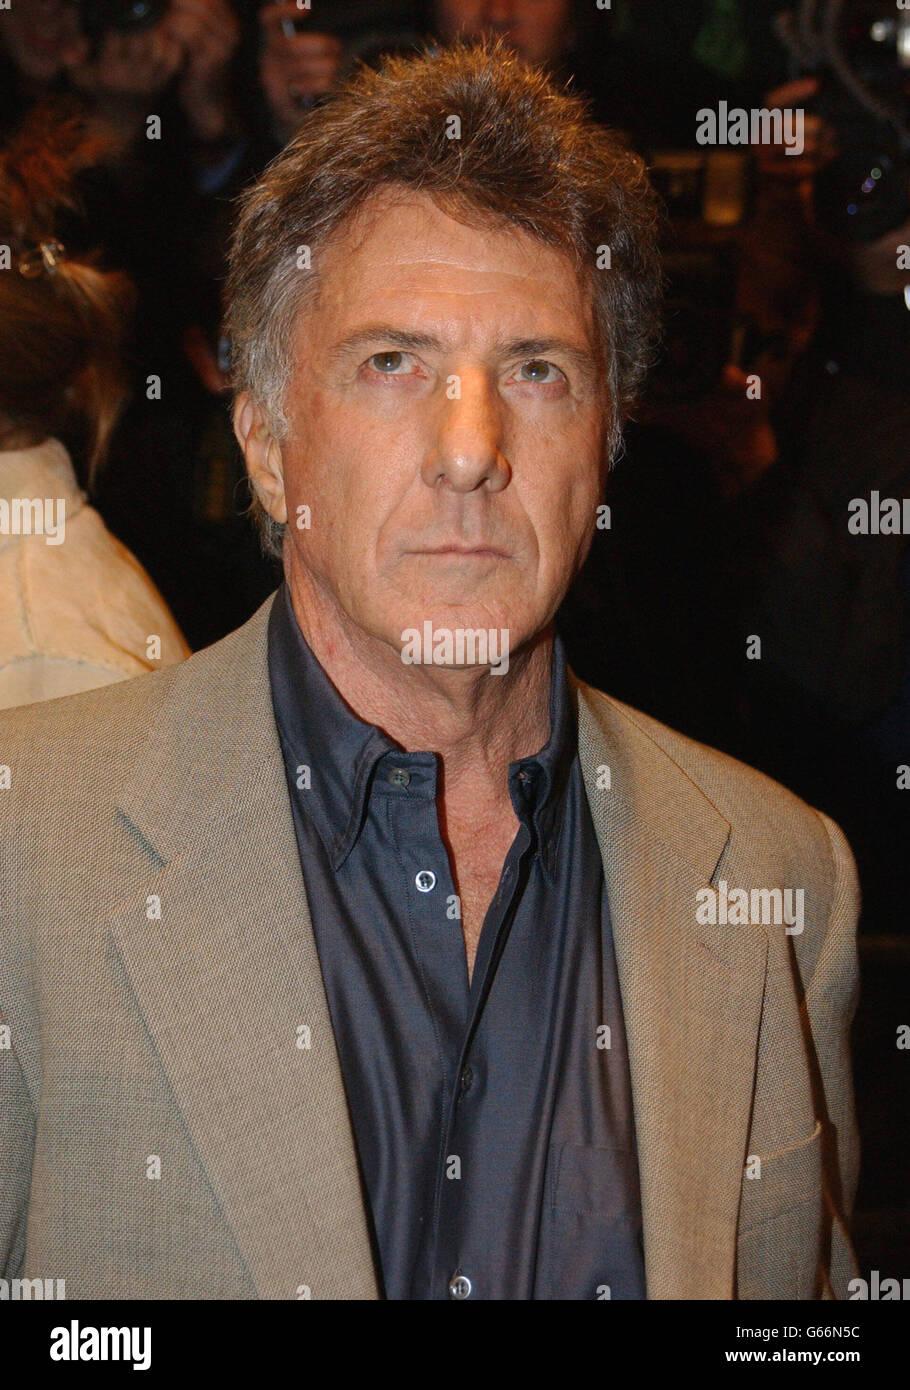 Hoffman - Empire Awards Stock Photo